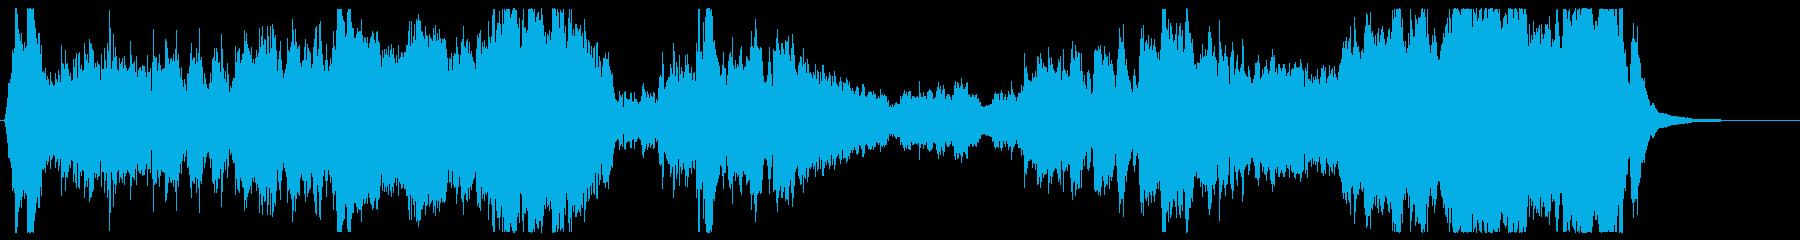 TRIUMPH SPIRITの再生済みの波形